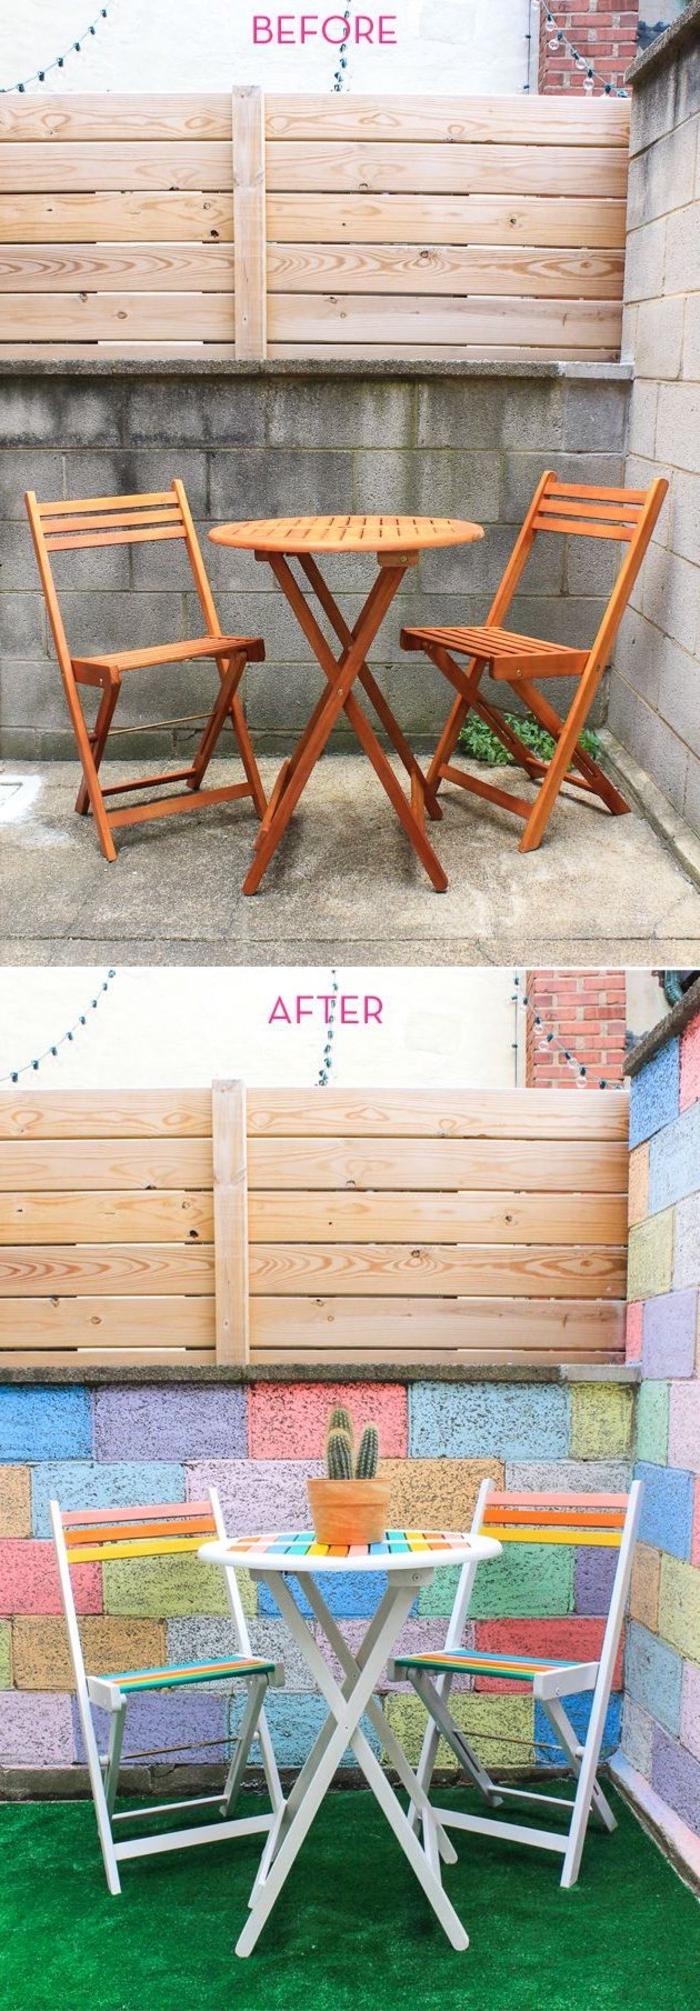 un mobilier reluat înainte de a fi transformat cu ajutorul vopselei, a Tabelul destul de reparat cu scaune de potrivire'aide de la peinture, une jolie table repeinte avec des chaises assorties